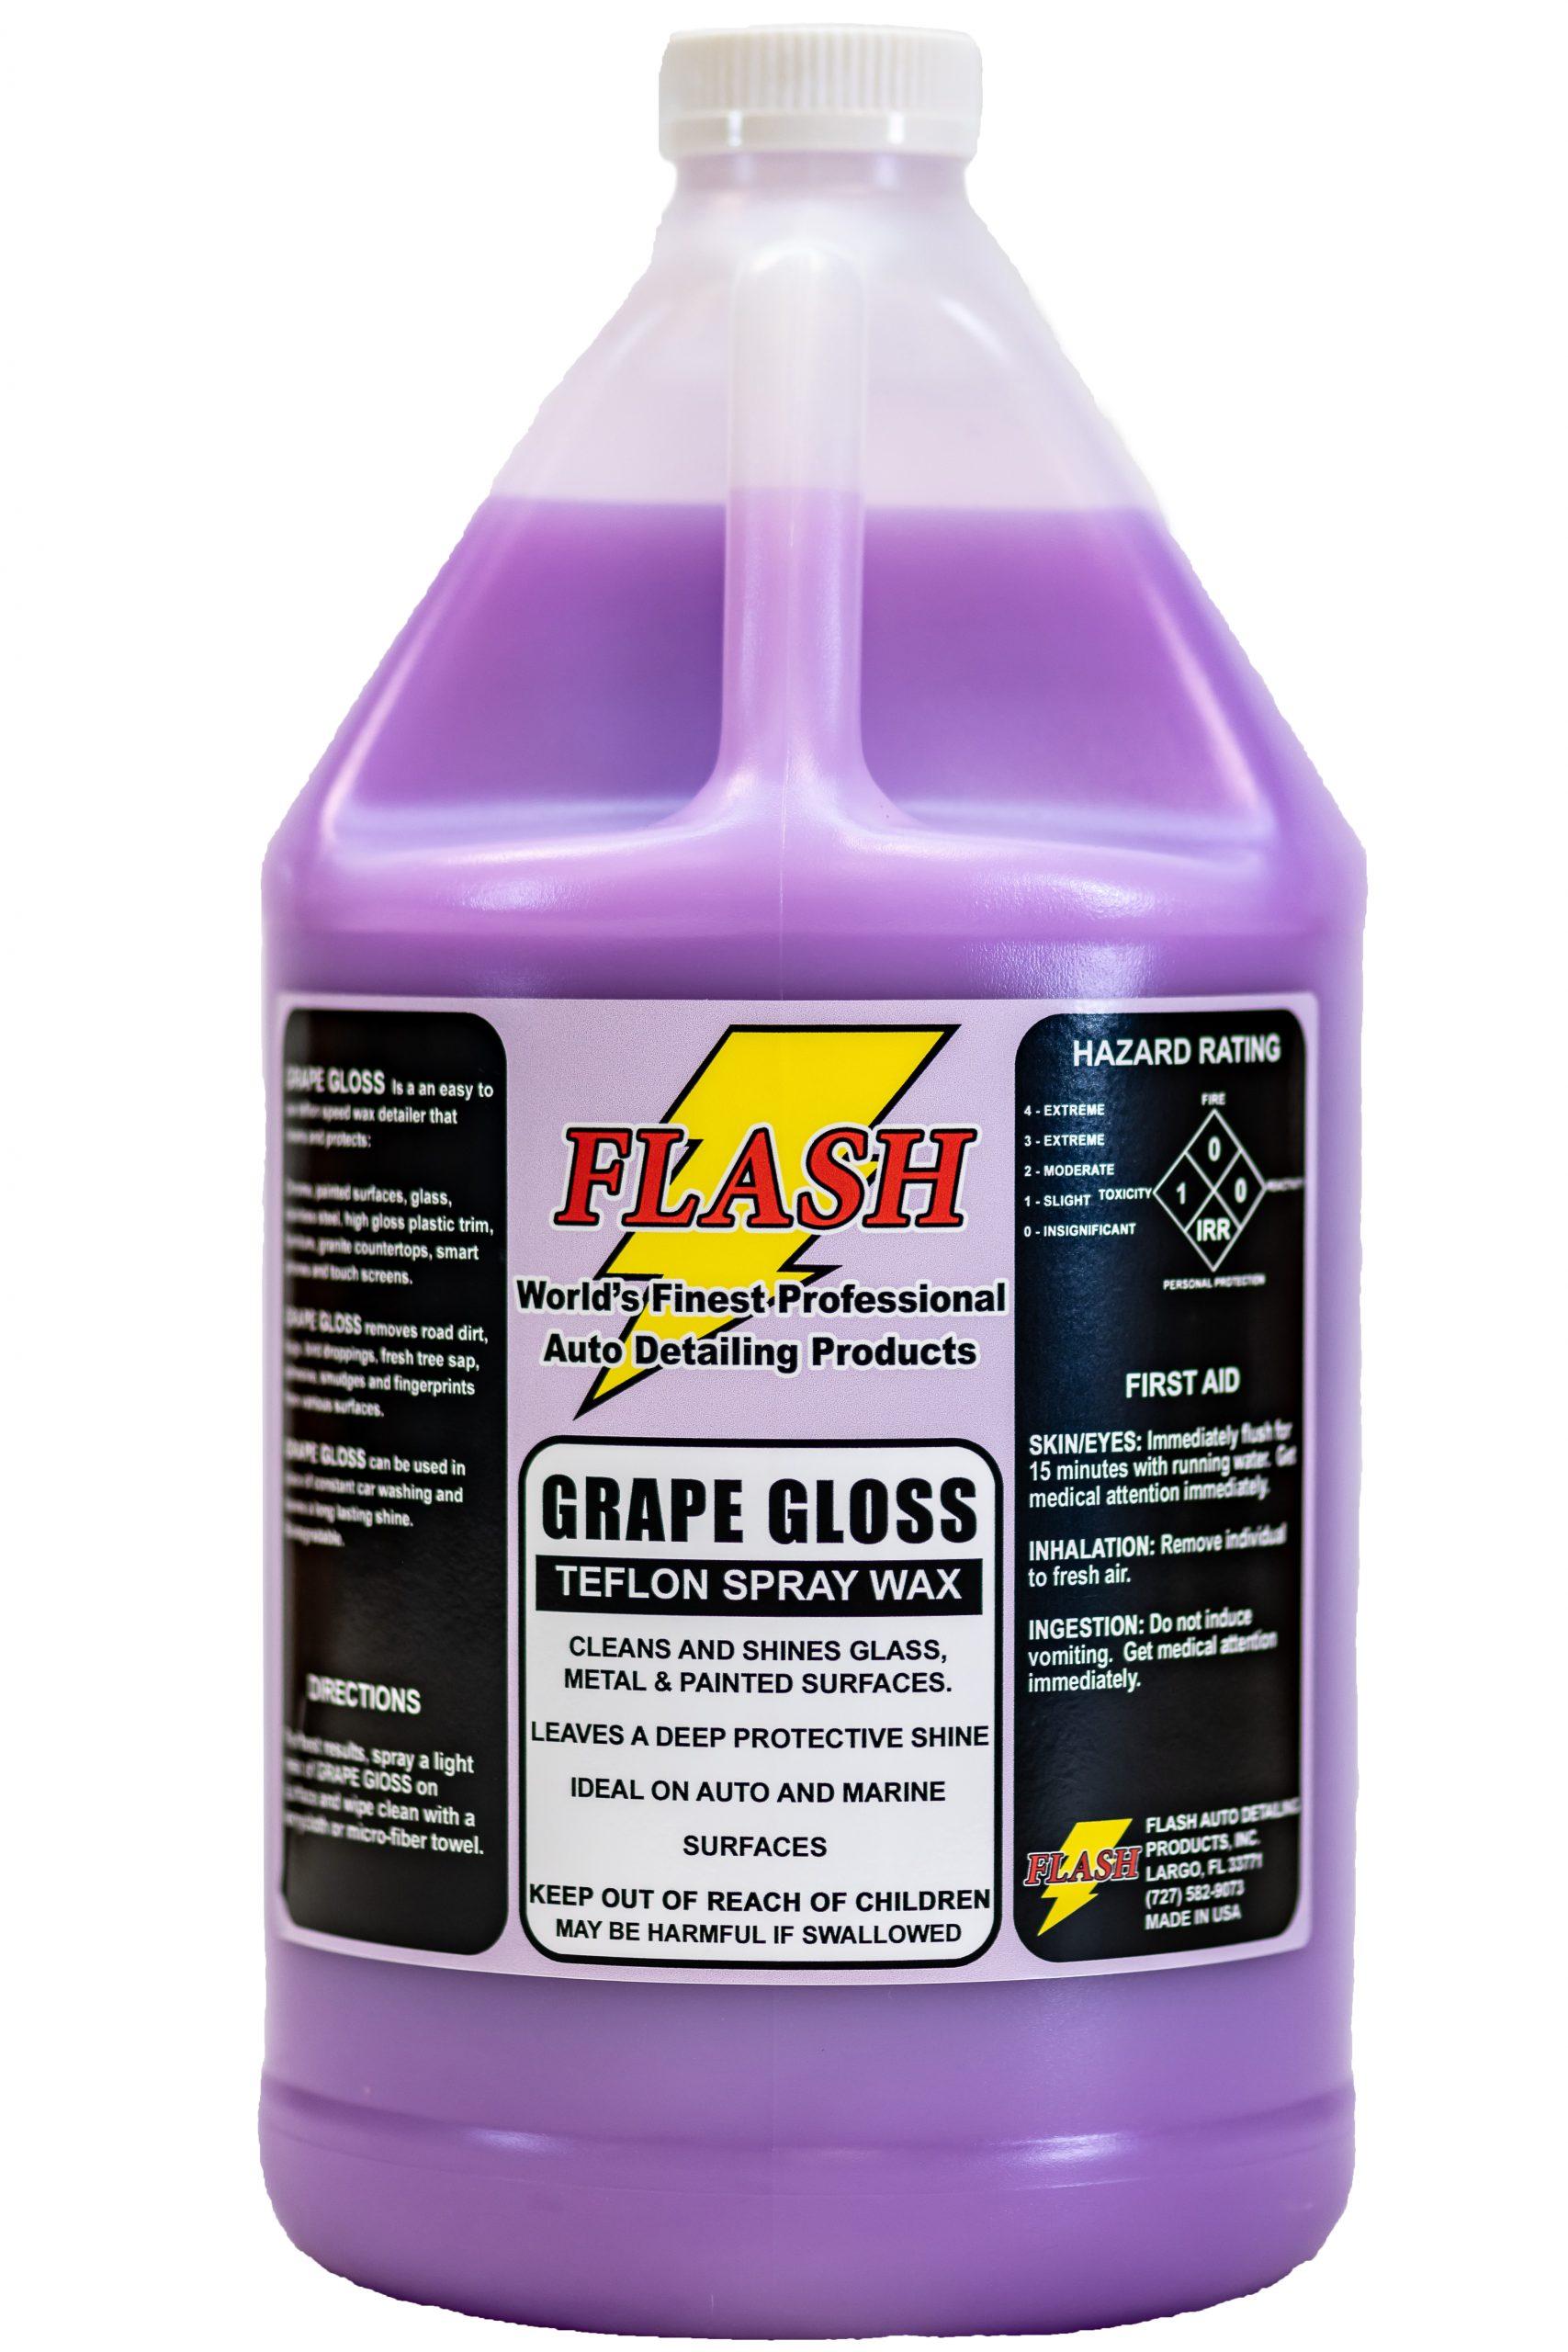 Grape Gloss Teflon Polymer Spray Wax Detailer Flash Auto Detailing Products